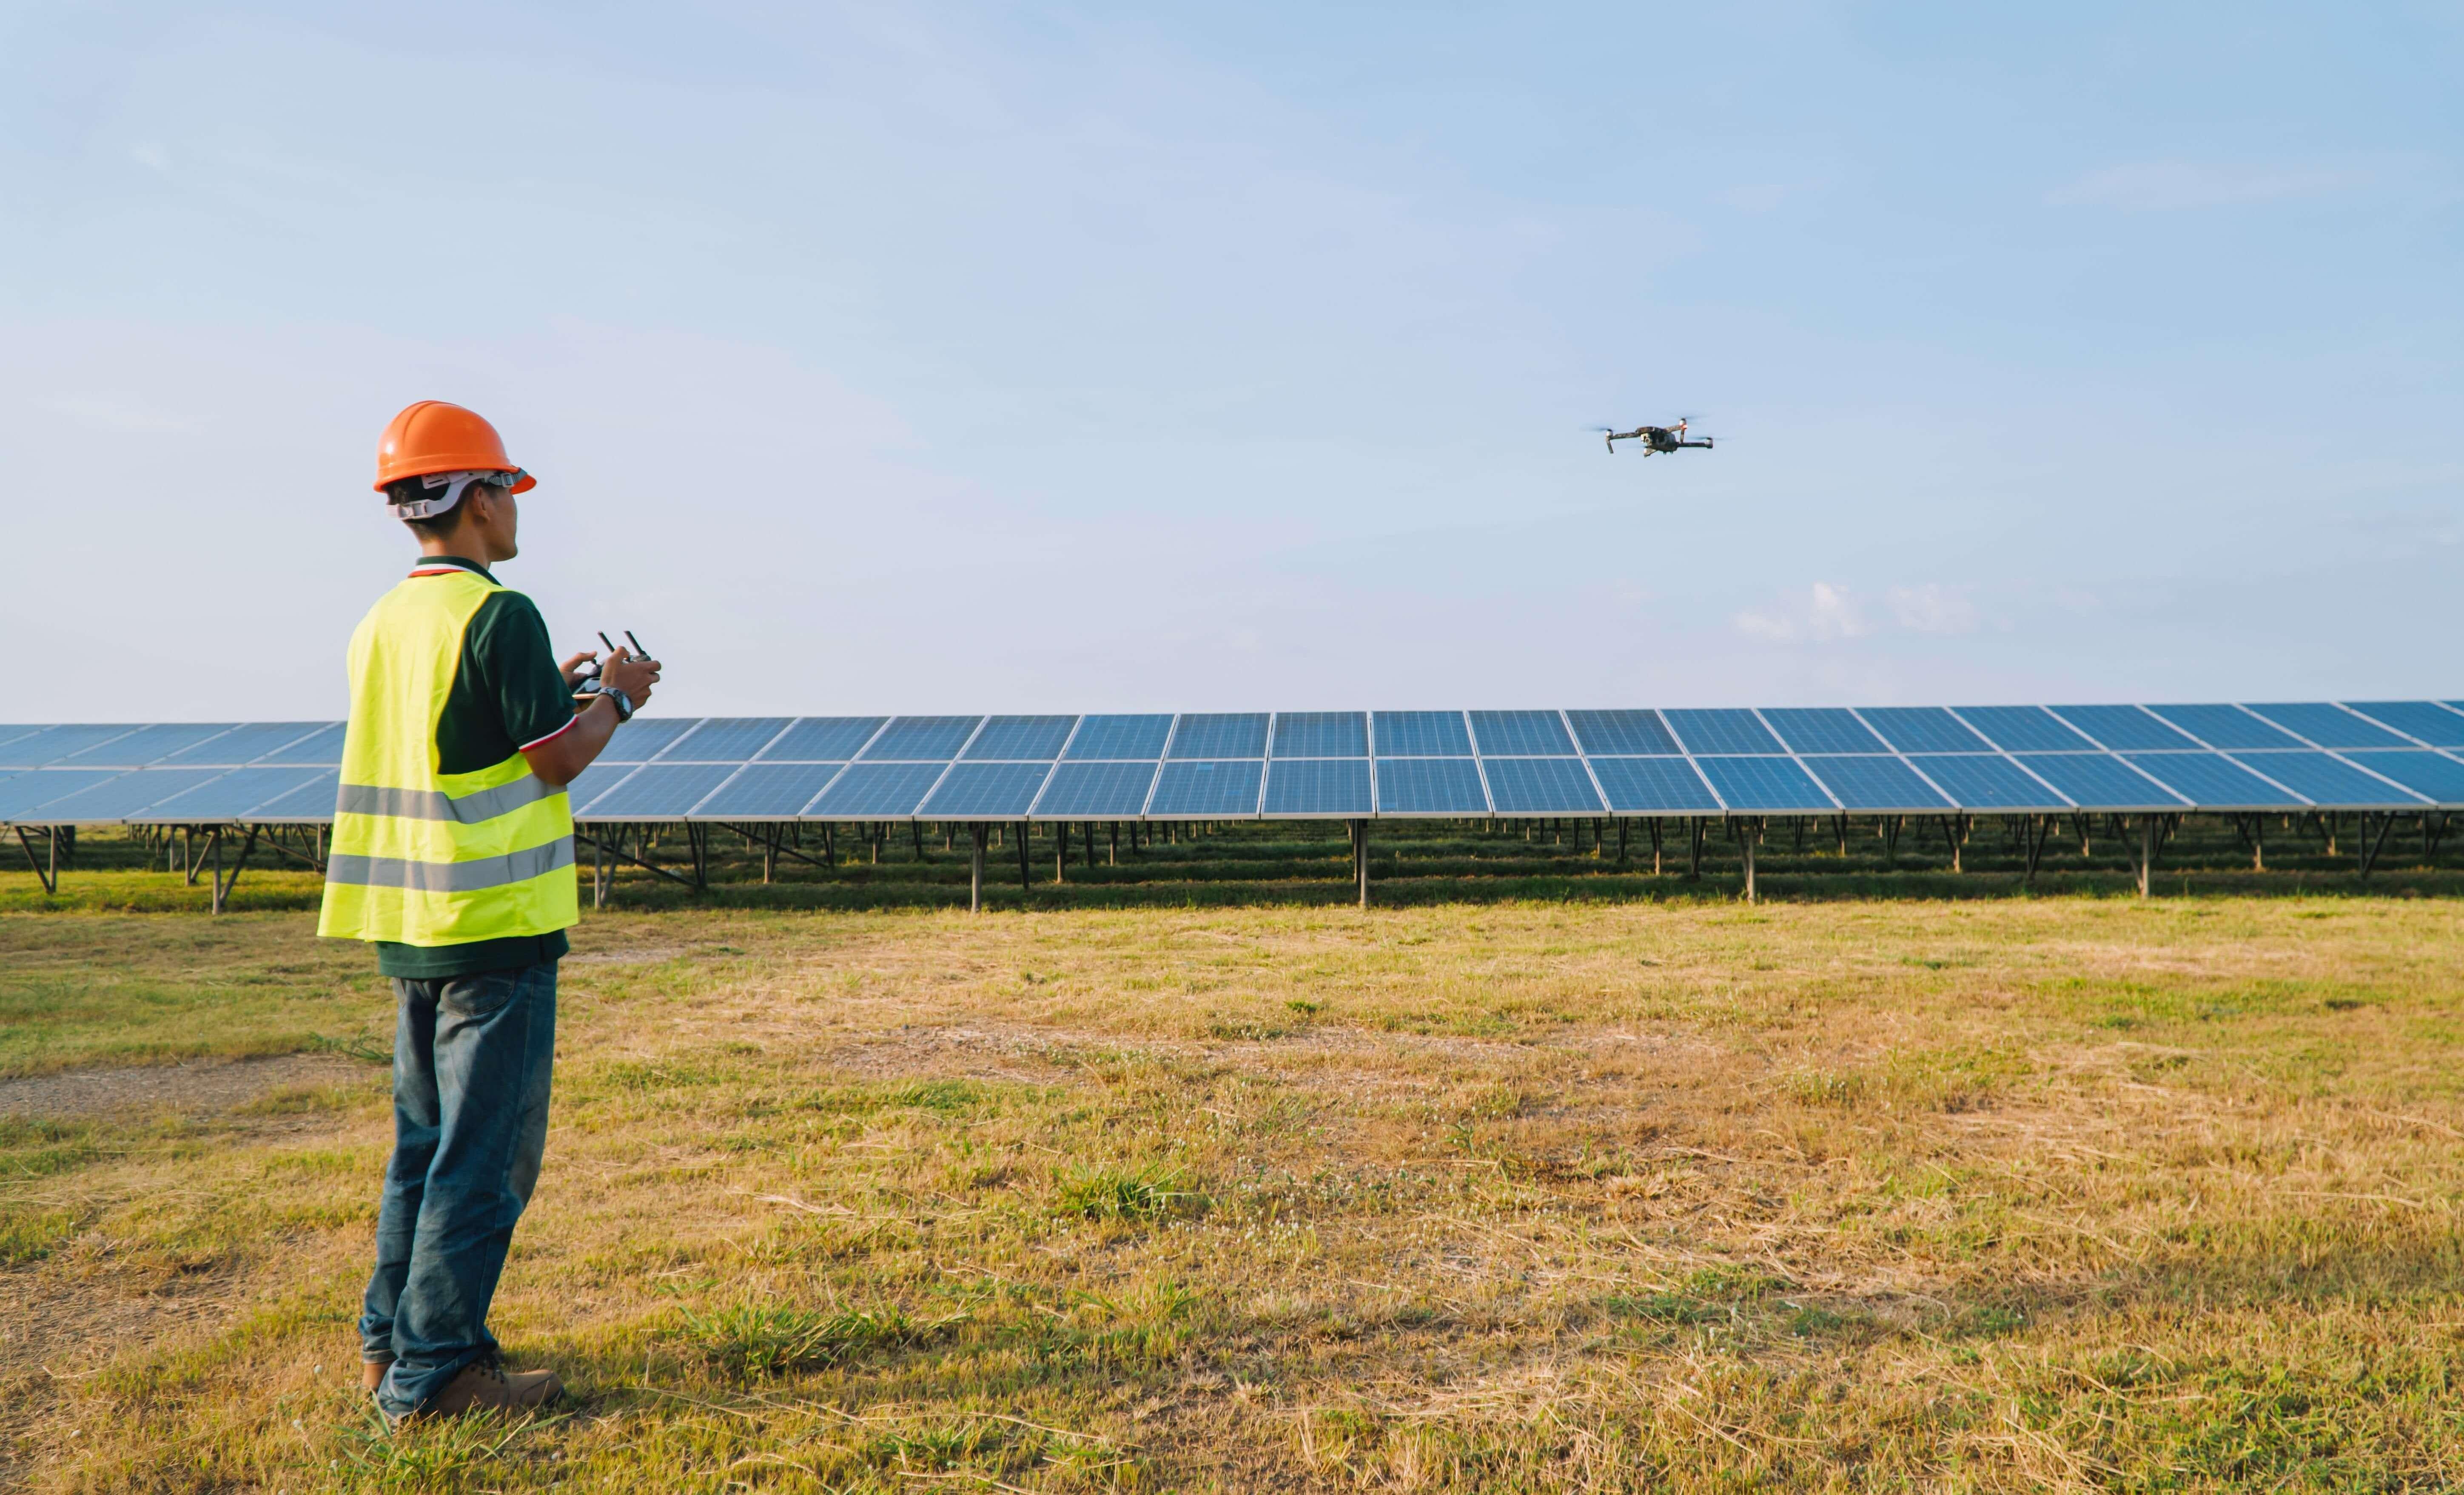 Solar panel inspection, solar farm, photovoltaic,drone technology, drone survey